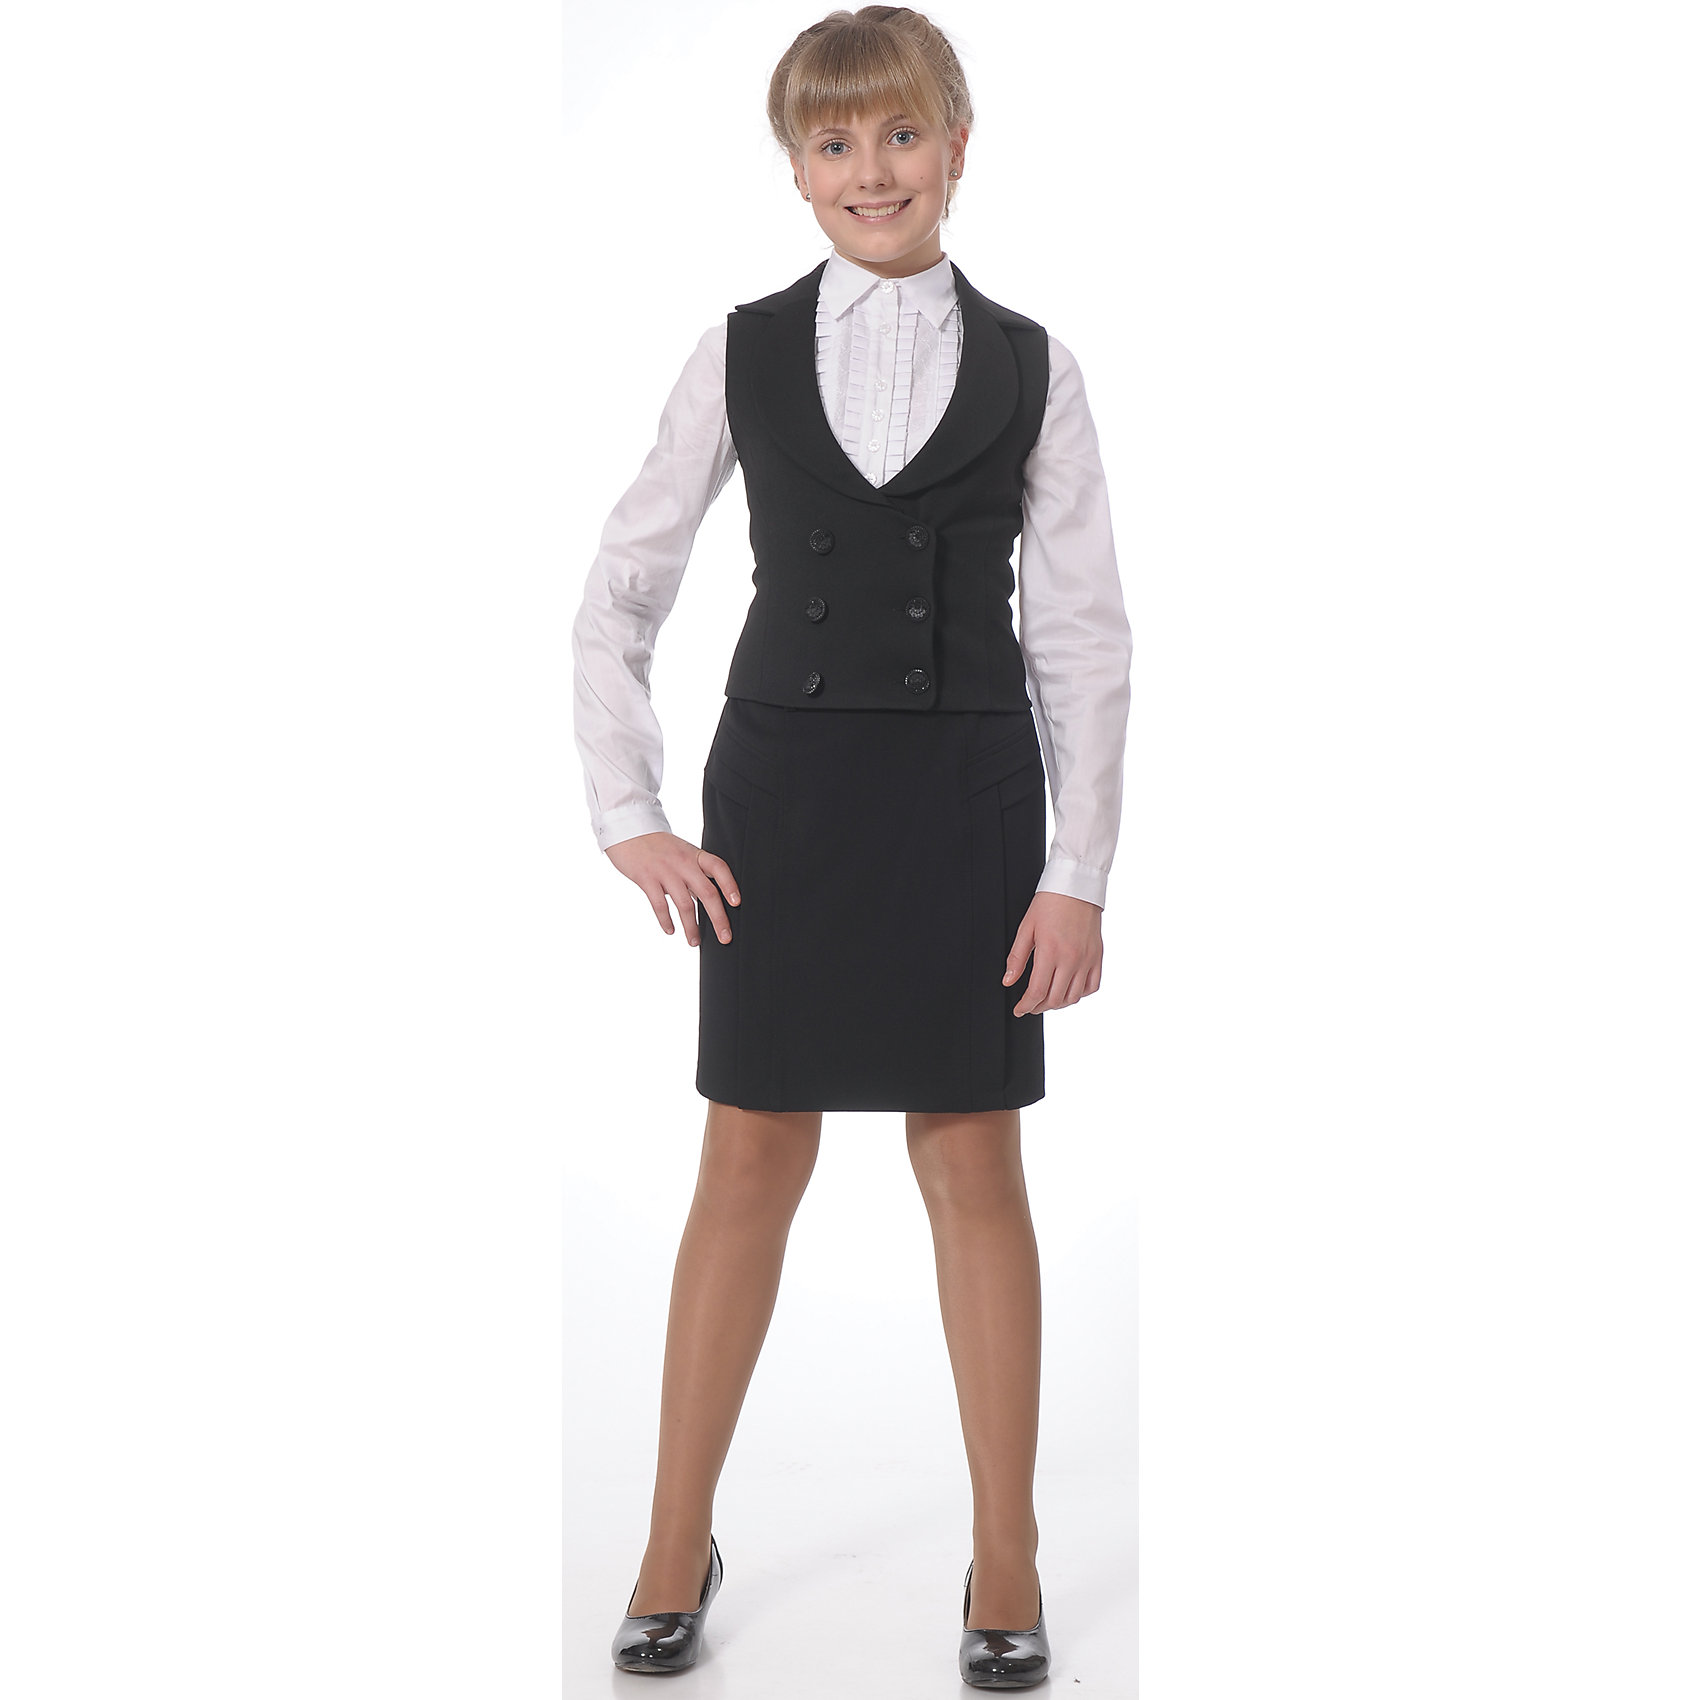 Skylake Жилет для девочки Агат Skylake skylake юбка для девочки агат skylake